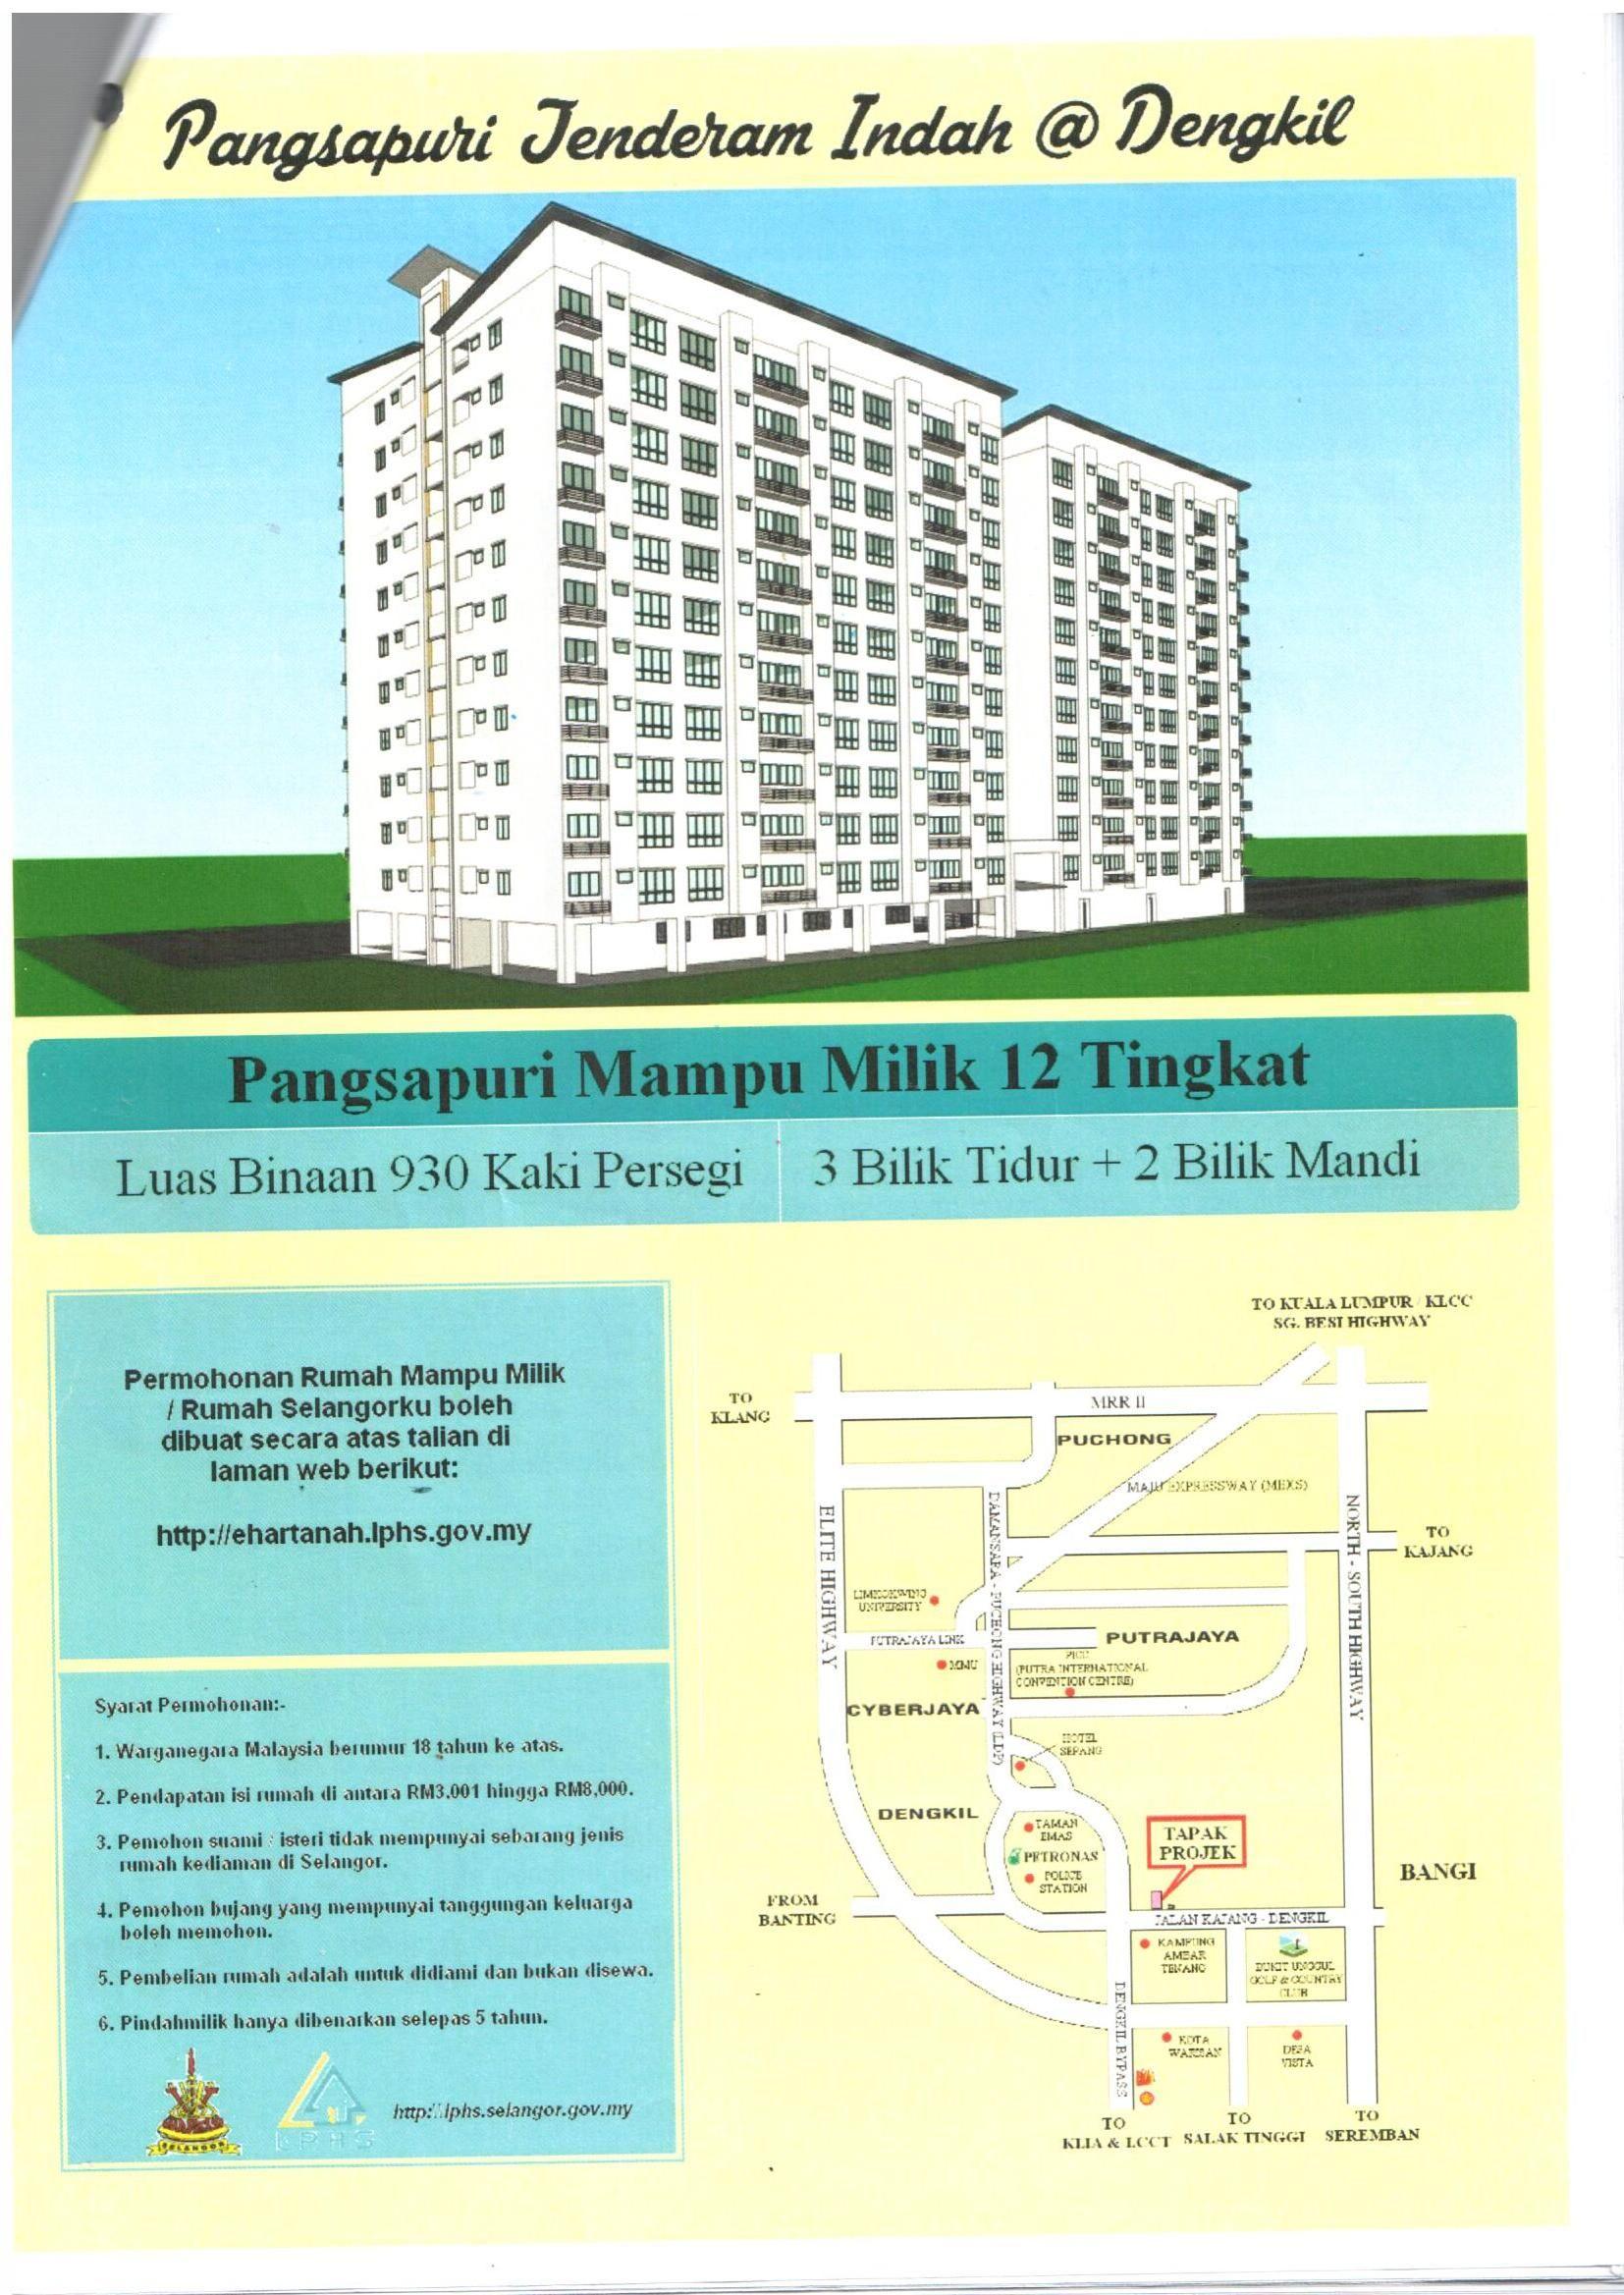 Pendaftaran Perumahan Dan Hartanah Selangor Selangor Dan Map